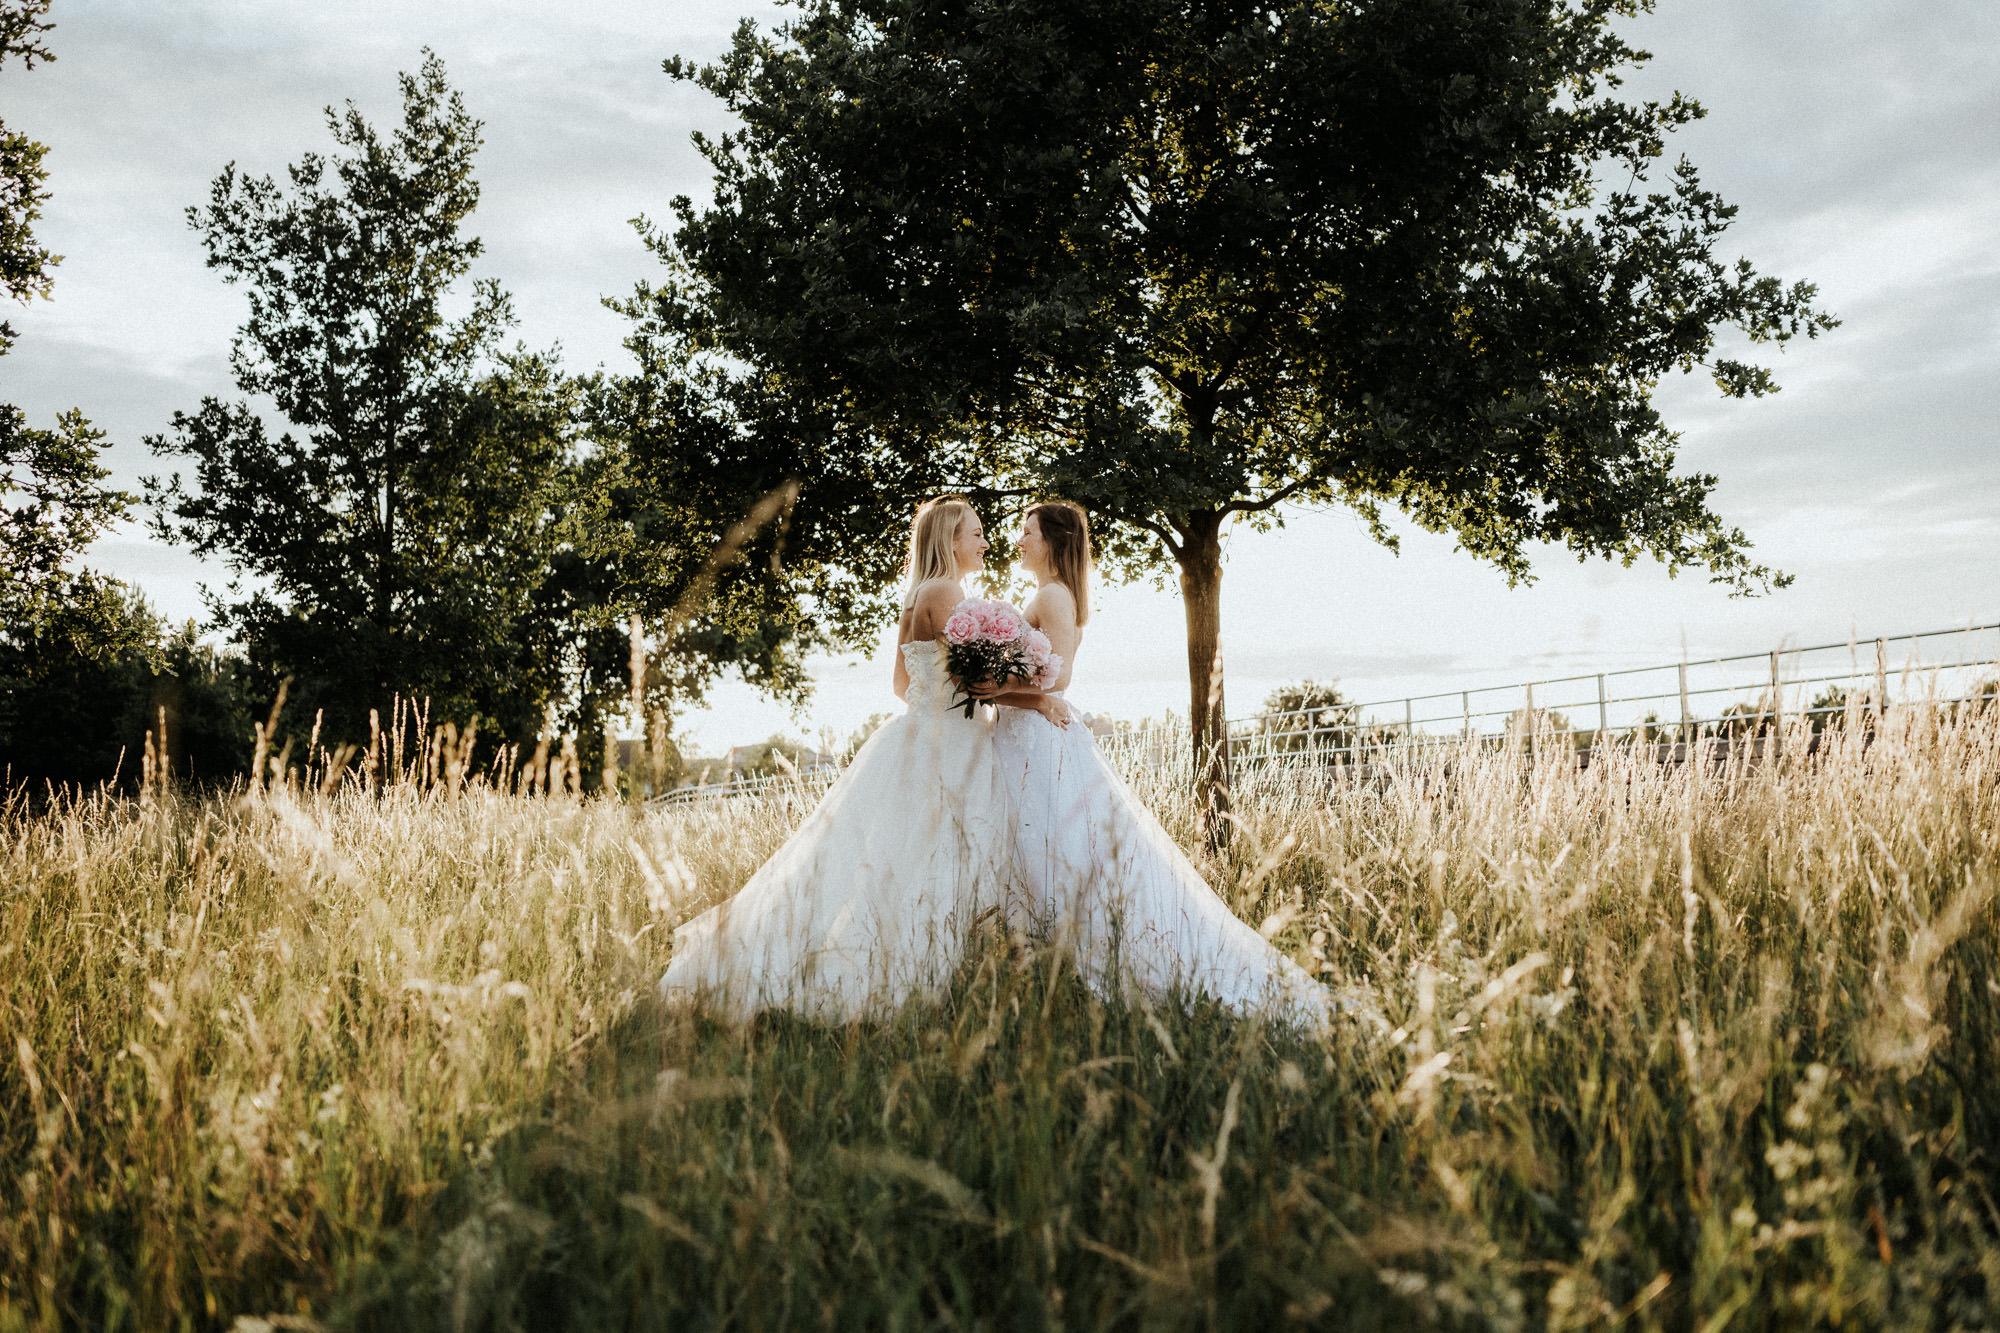 waltsmedia-hochzeitsreportage-after-wedding-shooting-berlin-8